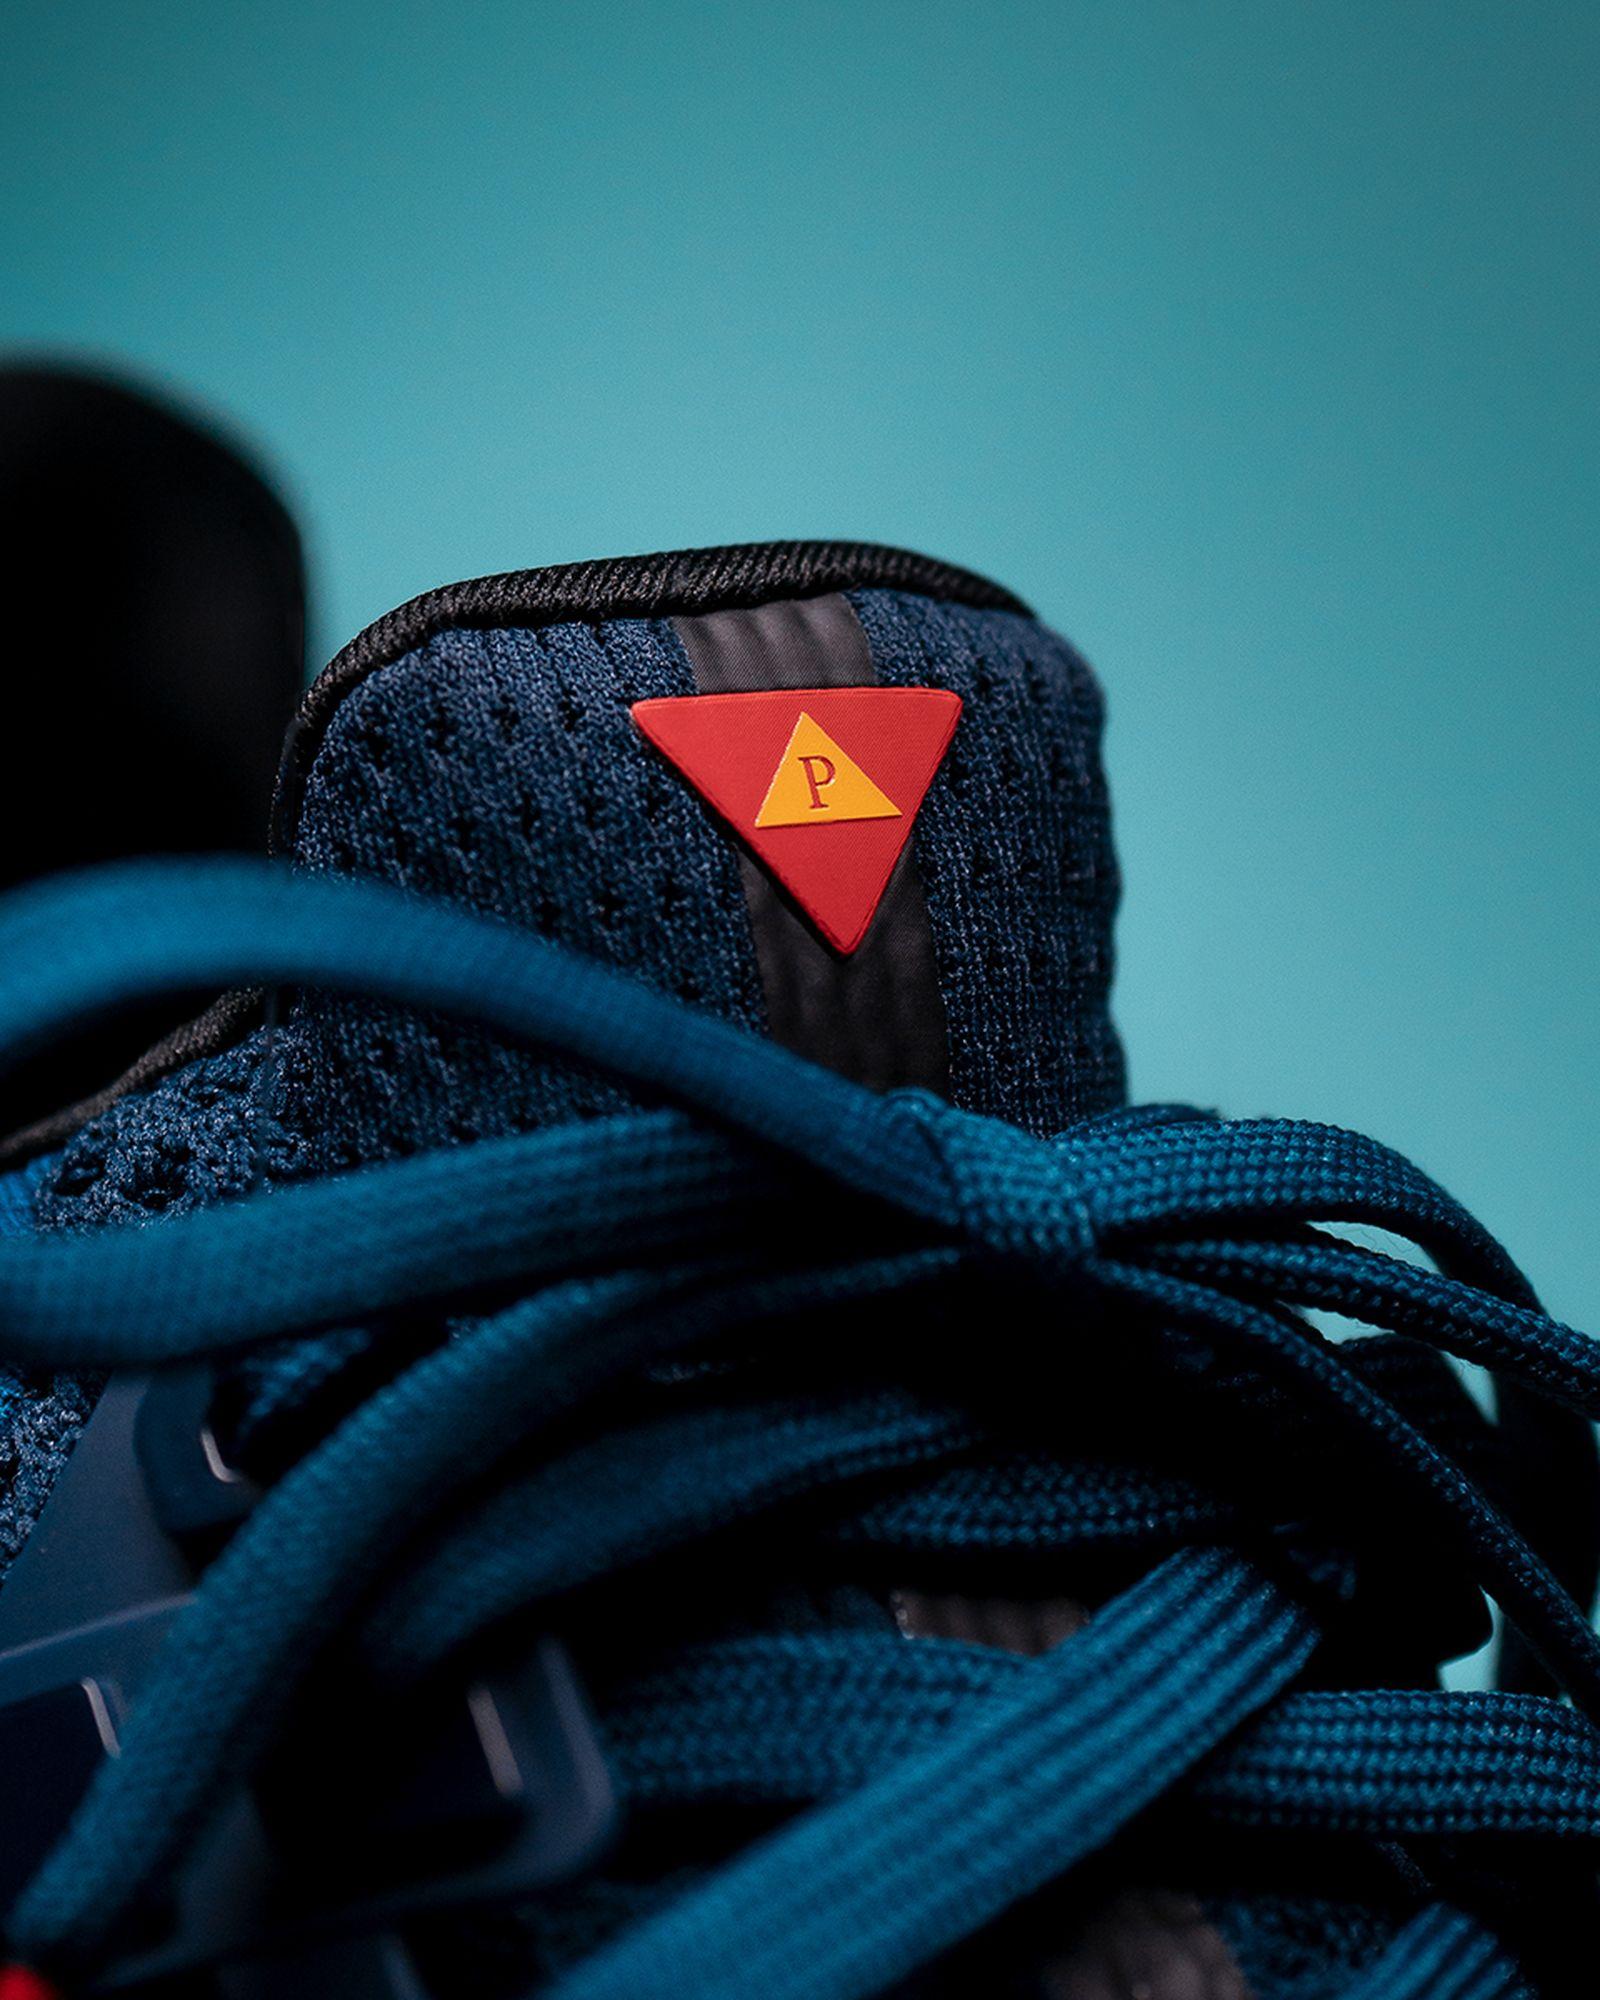 packer-adidas-consortium-ultra-4d-release-date-price-1-03